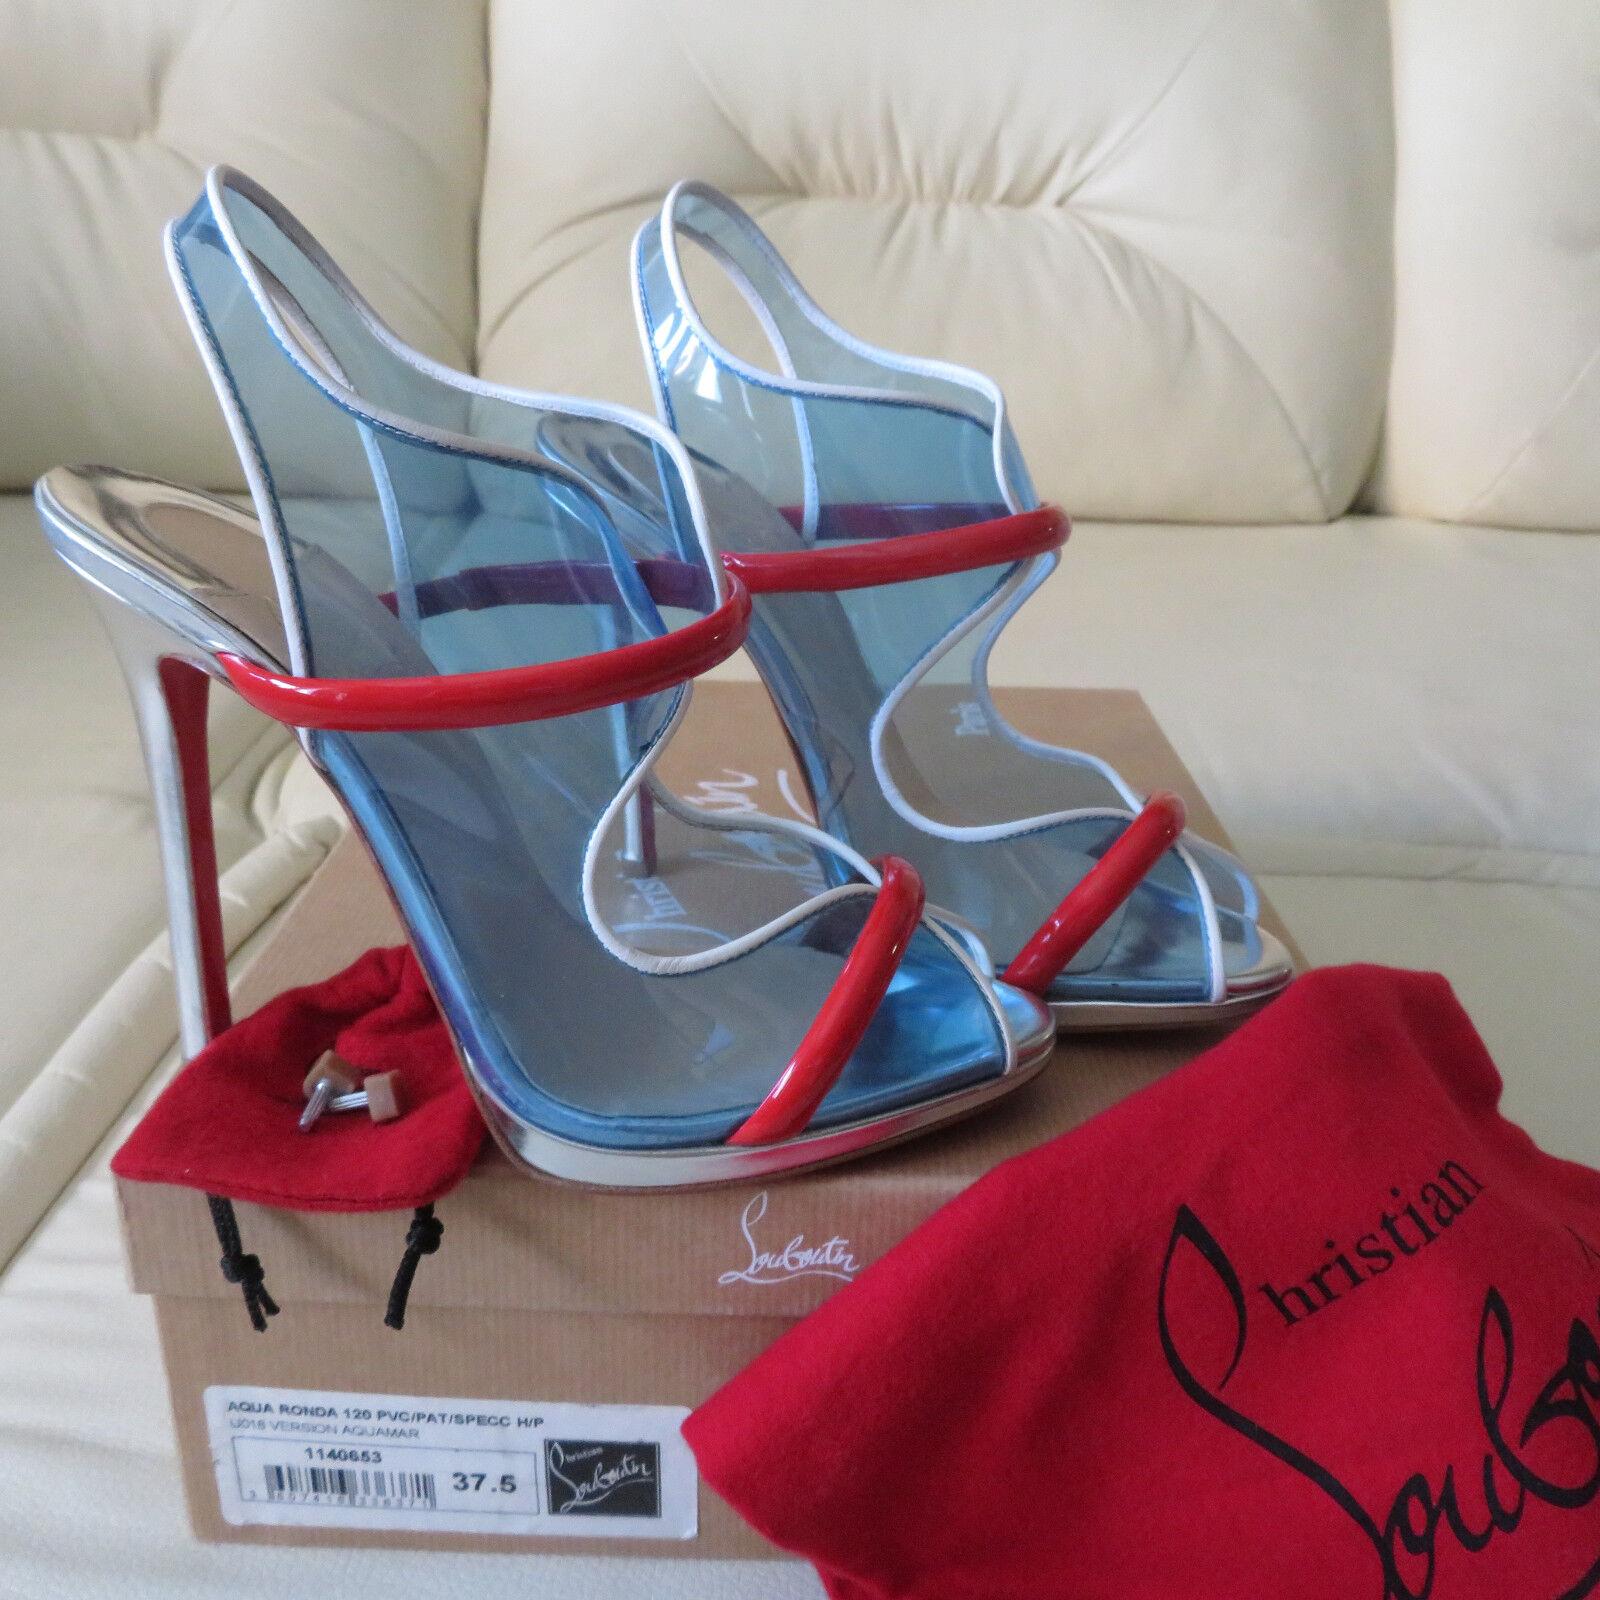 CHRISTIAN LOUBOUTIN Aqua Ronda 120 PVC bluee Red Platform Heels Sandals 37.5